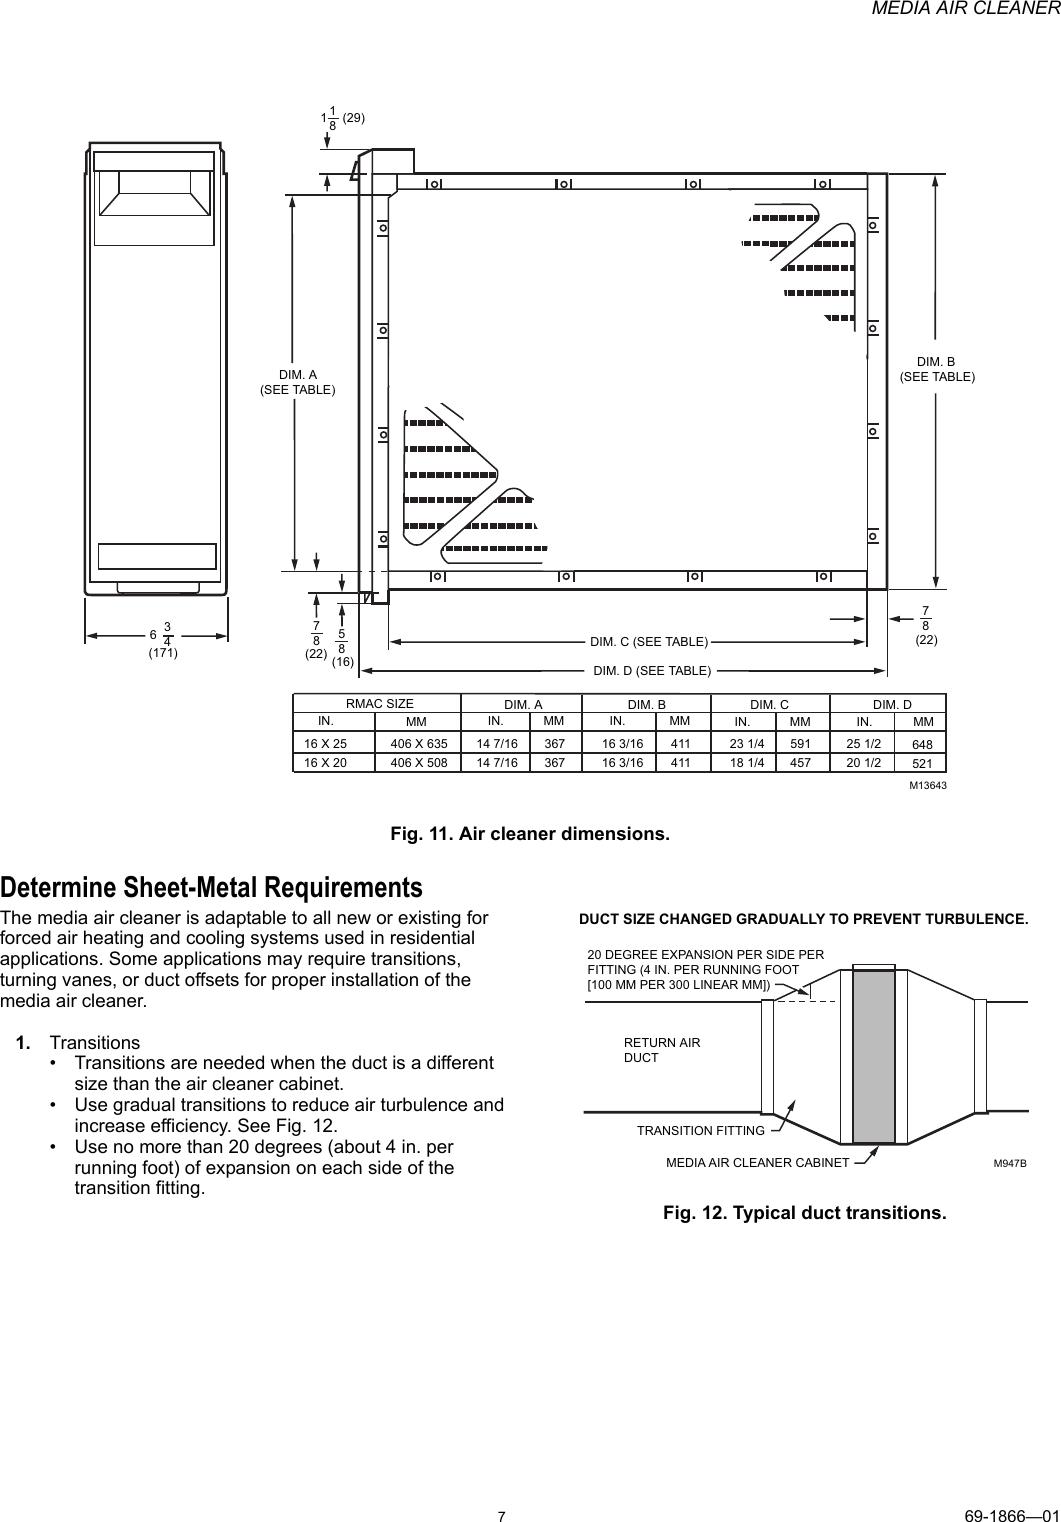 Honeywell Rmac1625 Installation Information 69 1866_A Media Air Cleaner